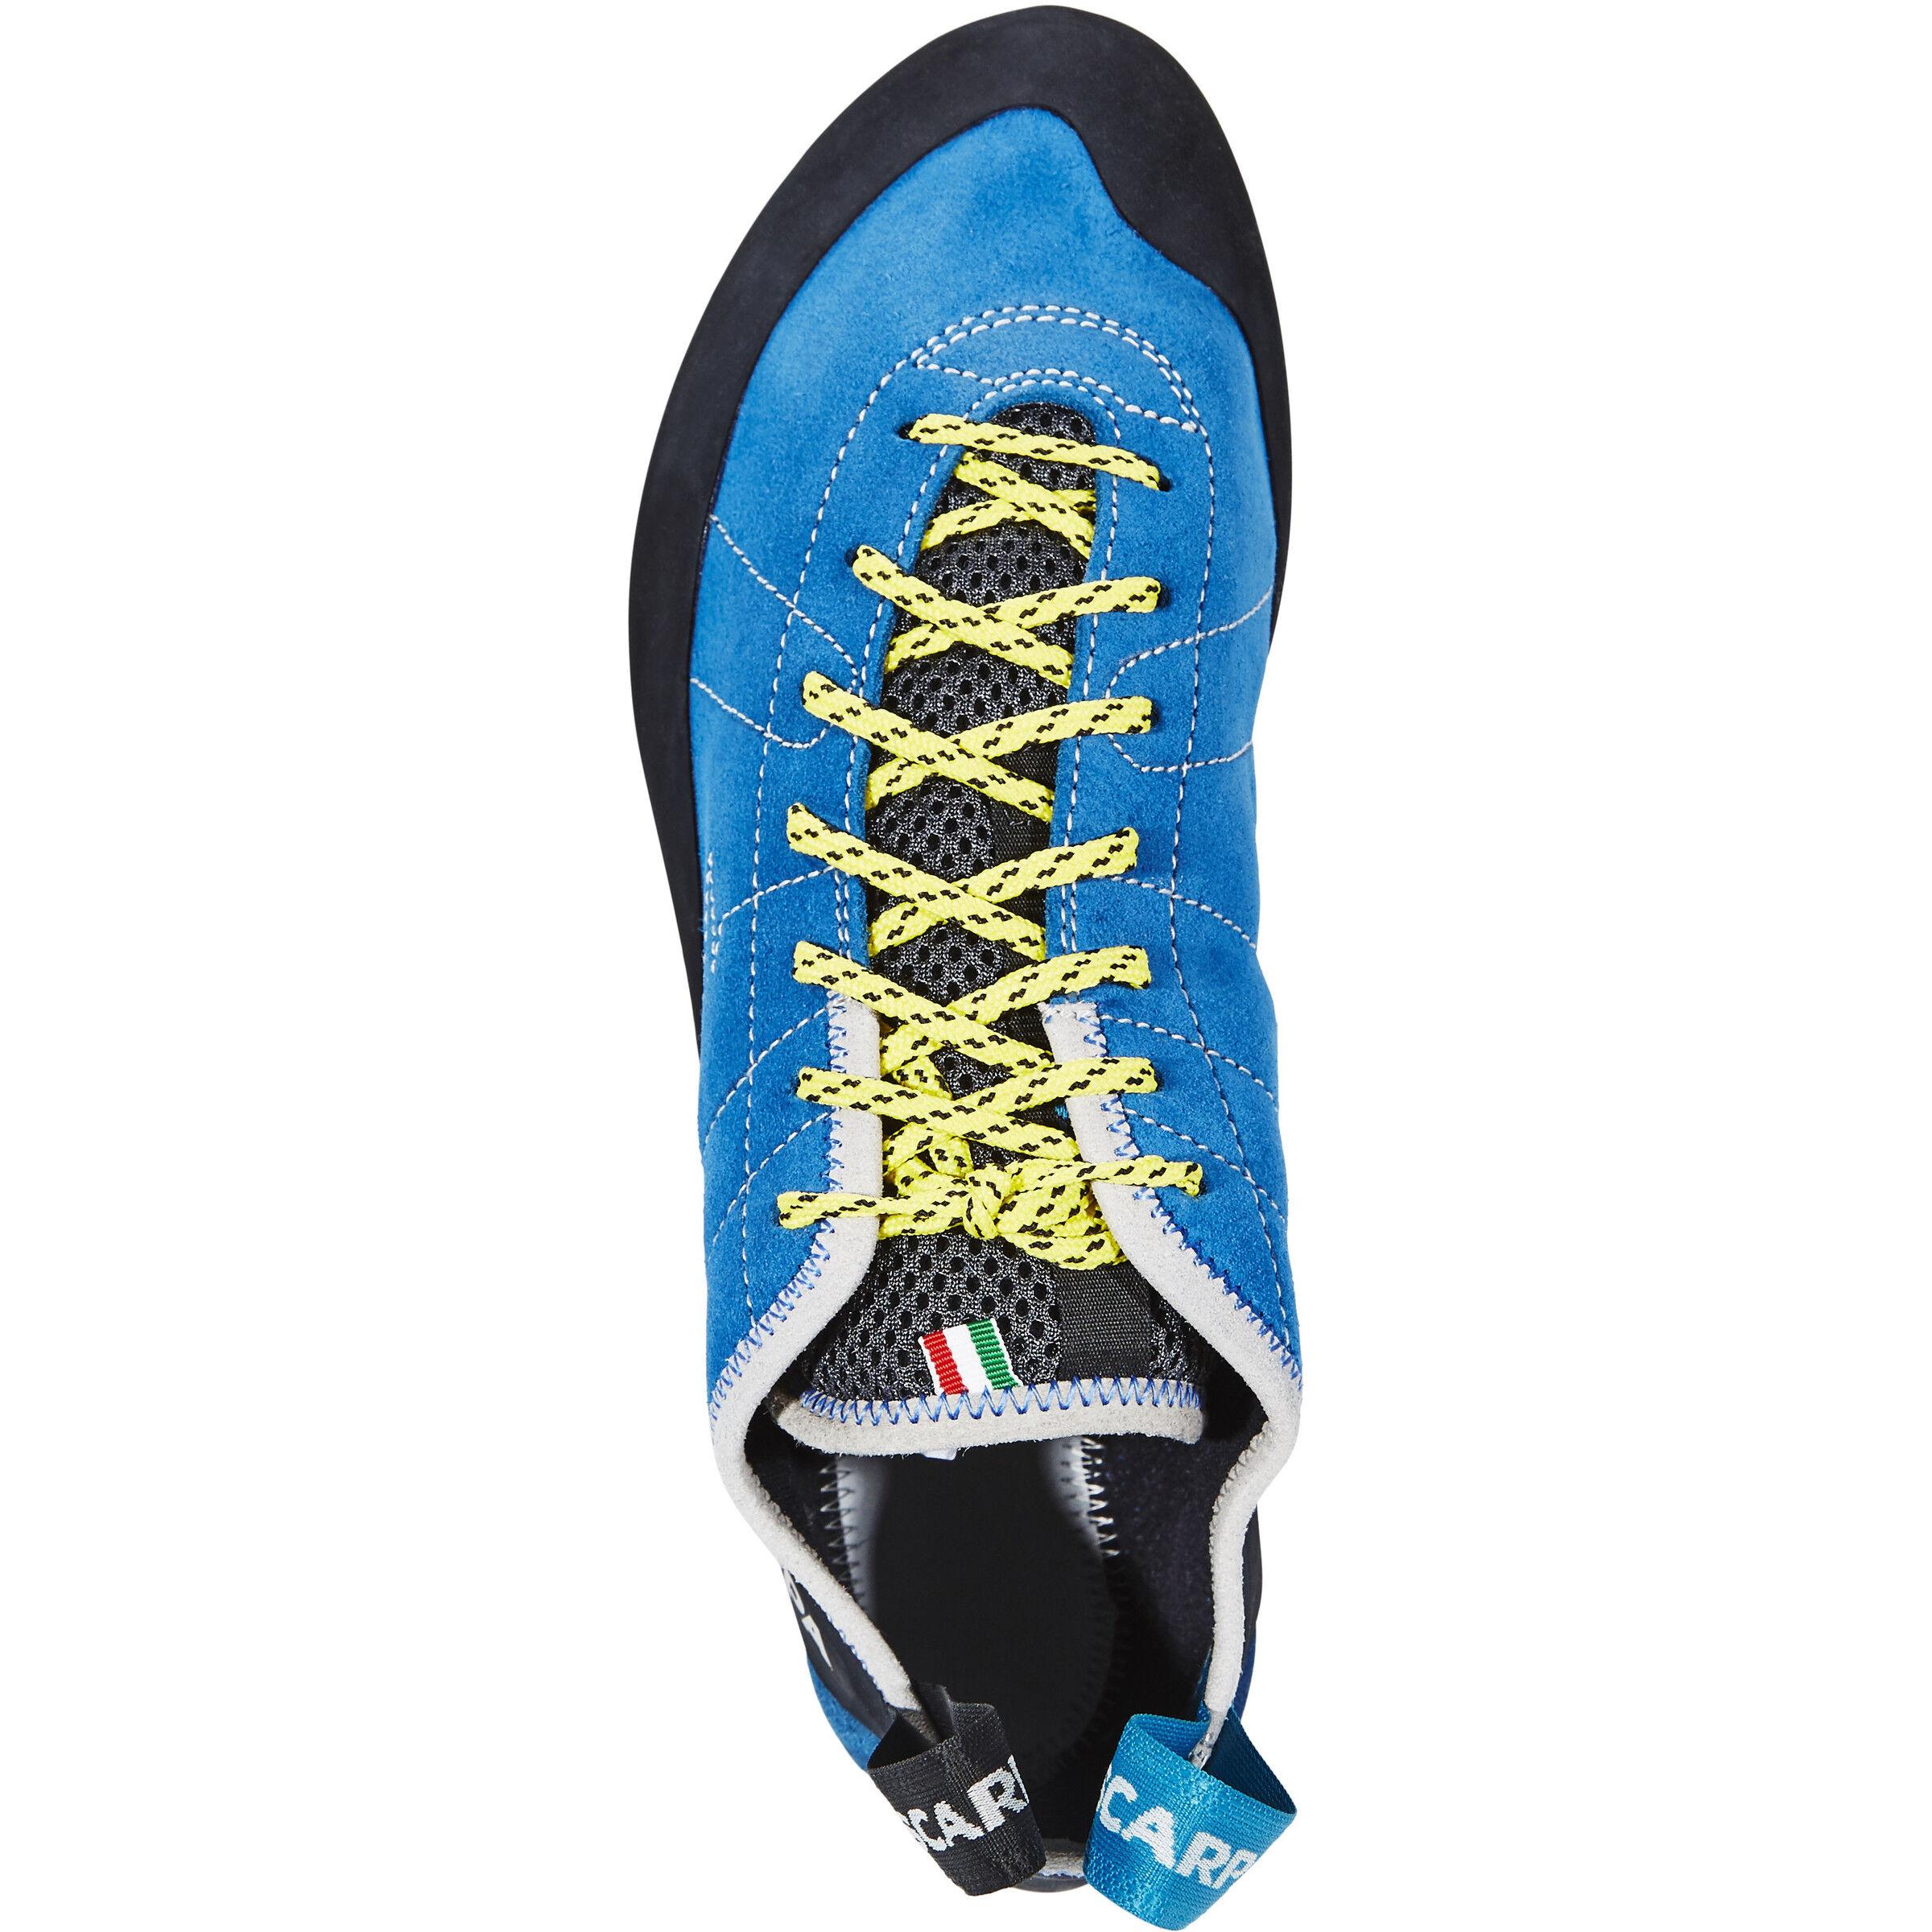 Scarpa Schuhe Helix Men Gr/ö/ße 46 Hyper Blue